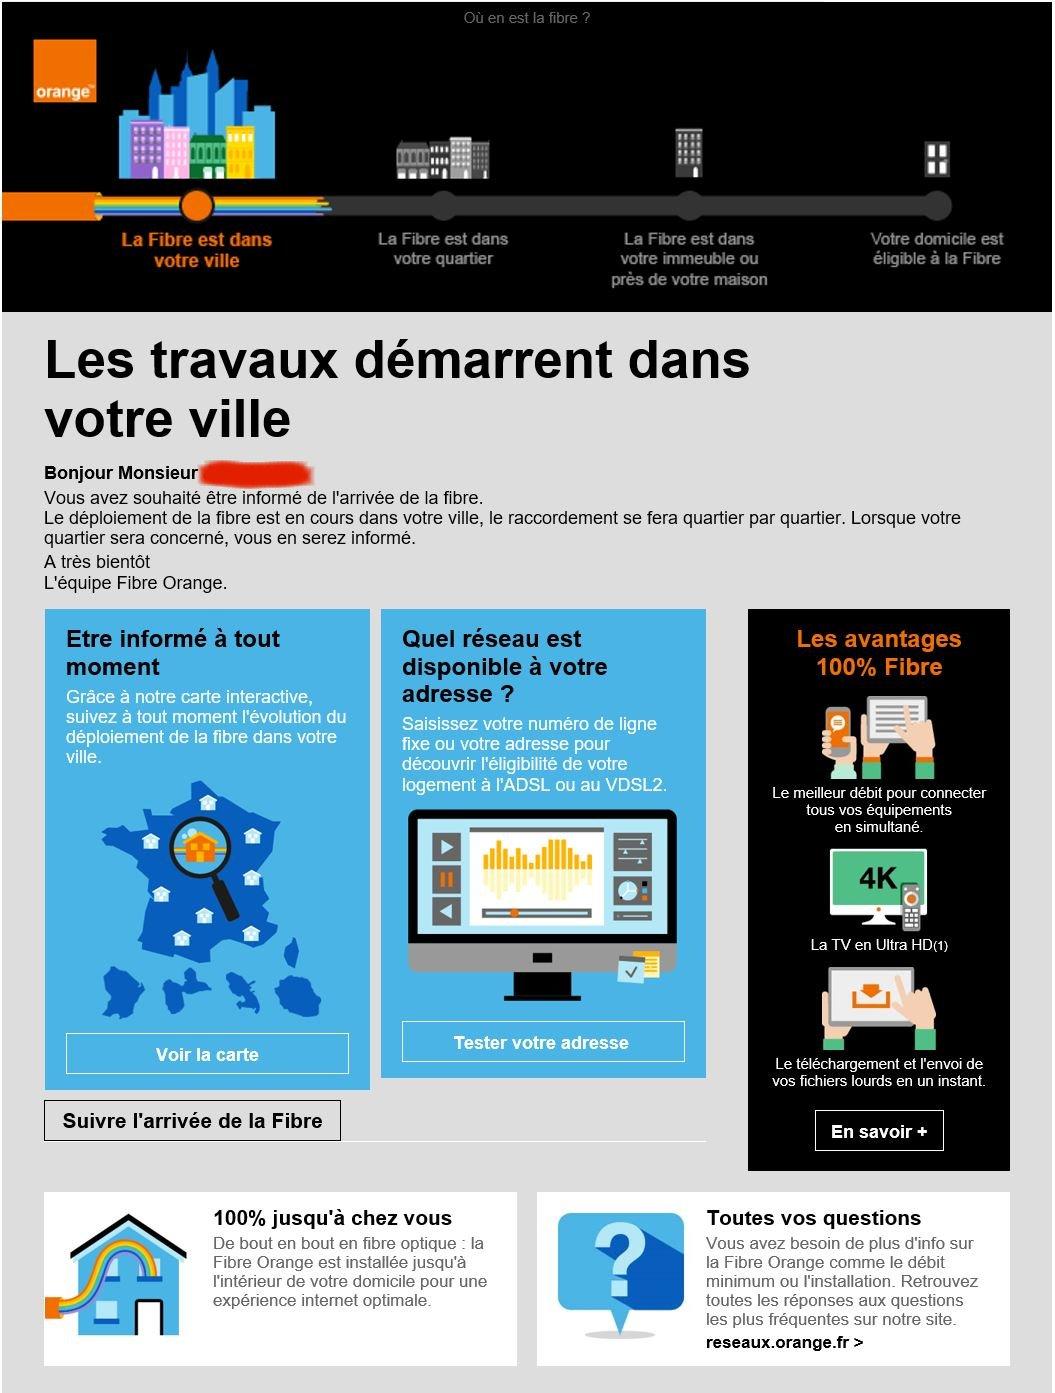 http://n.adrien.free.fr/screenshots/forum-orange/fibre_illange2.JPG